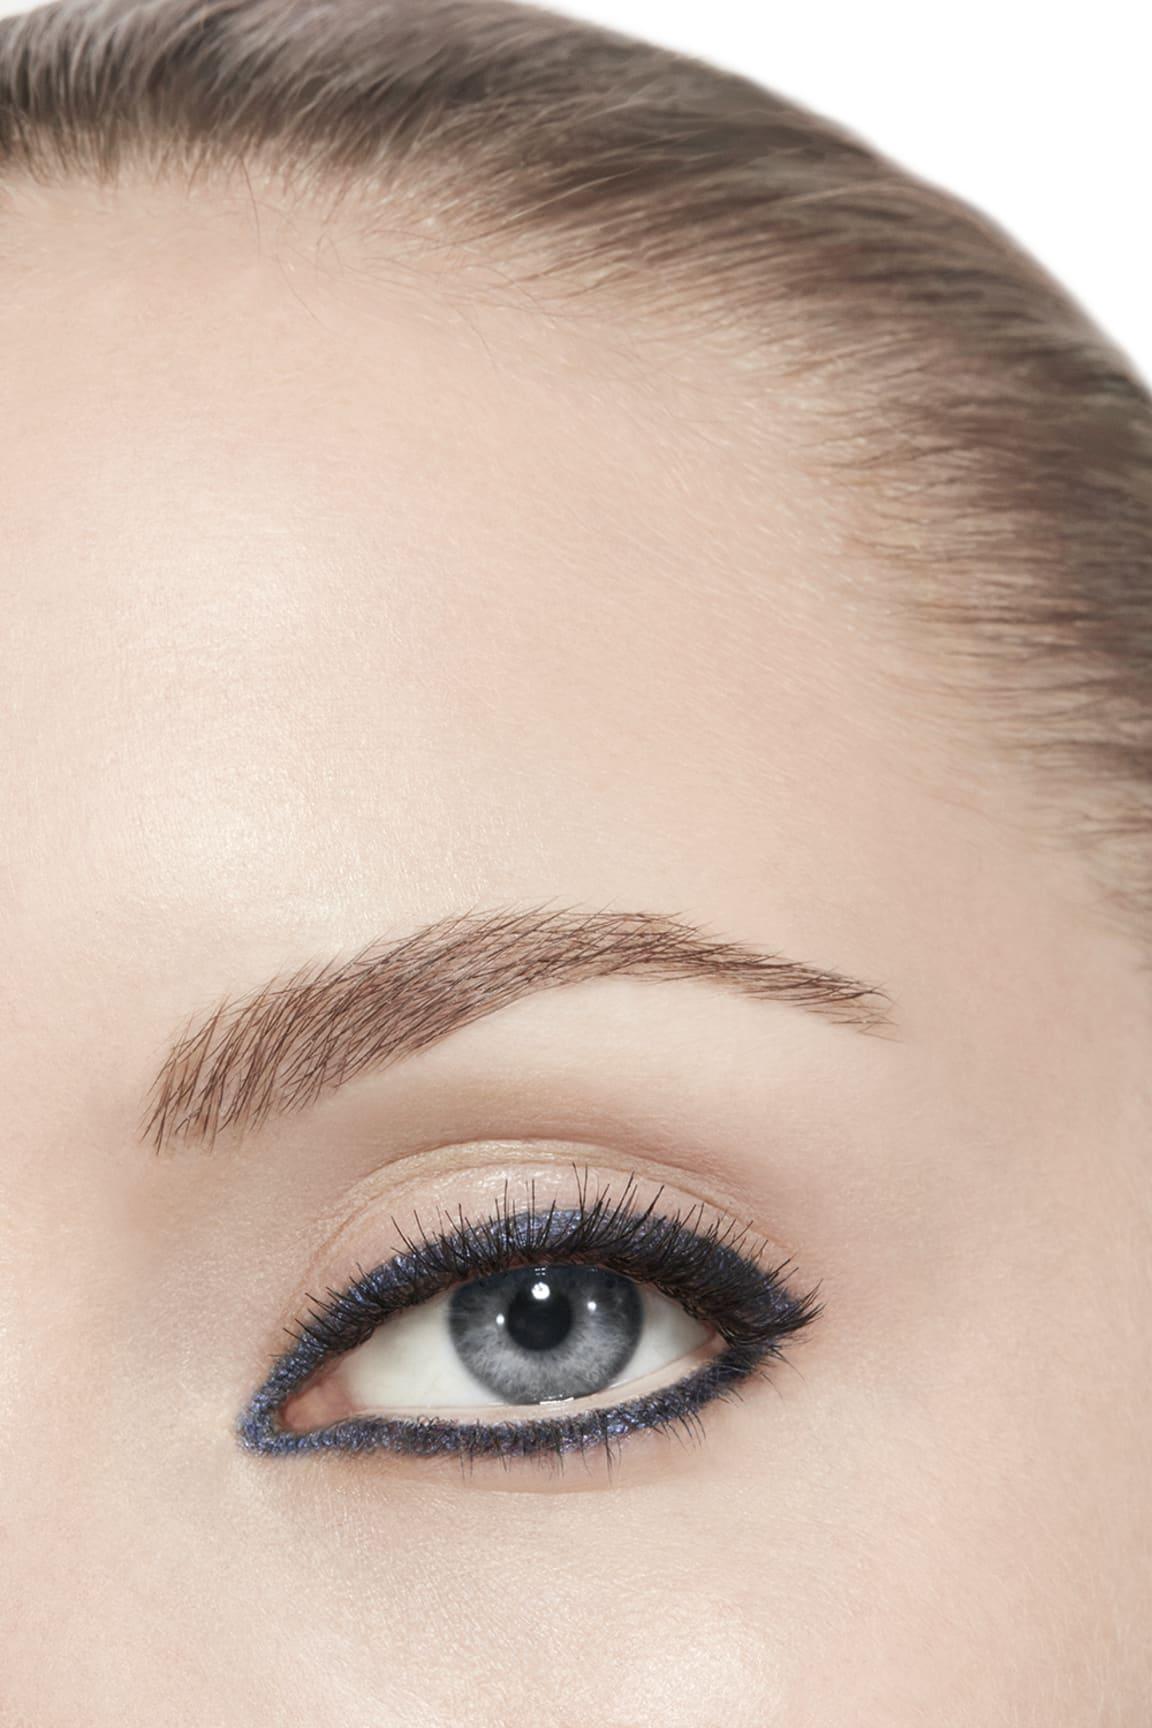 Anwendung Make-up-Bild 3 - STYLO YEUX WATERPROOF 30 - MARINE